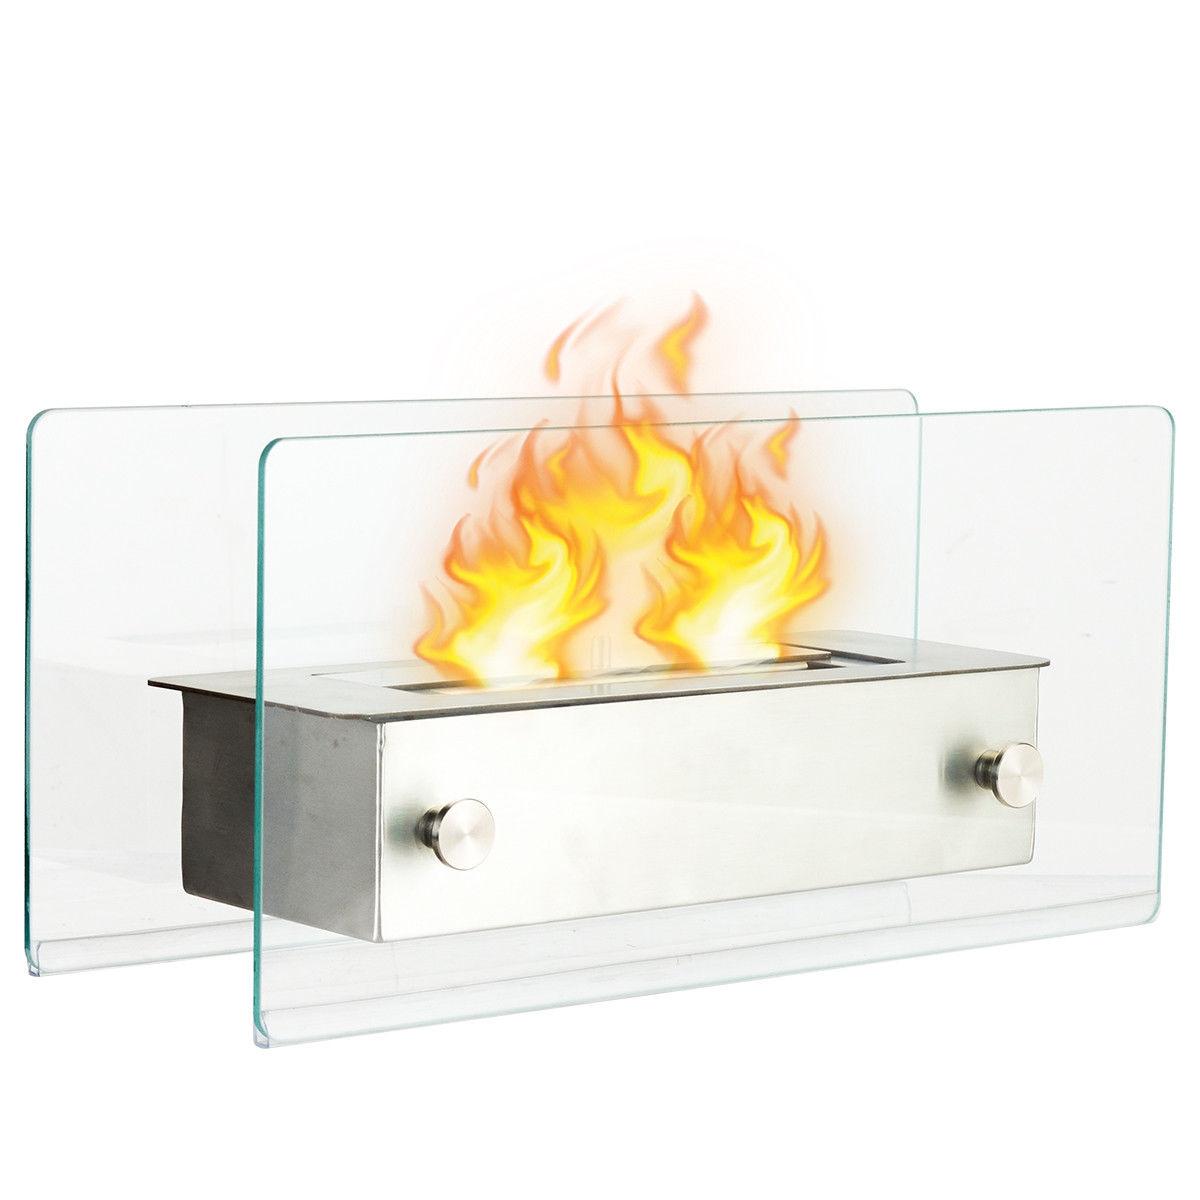 Outdoor Indoor Tabletop Portable Stainless Steel Ventless Fireplace